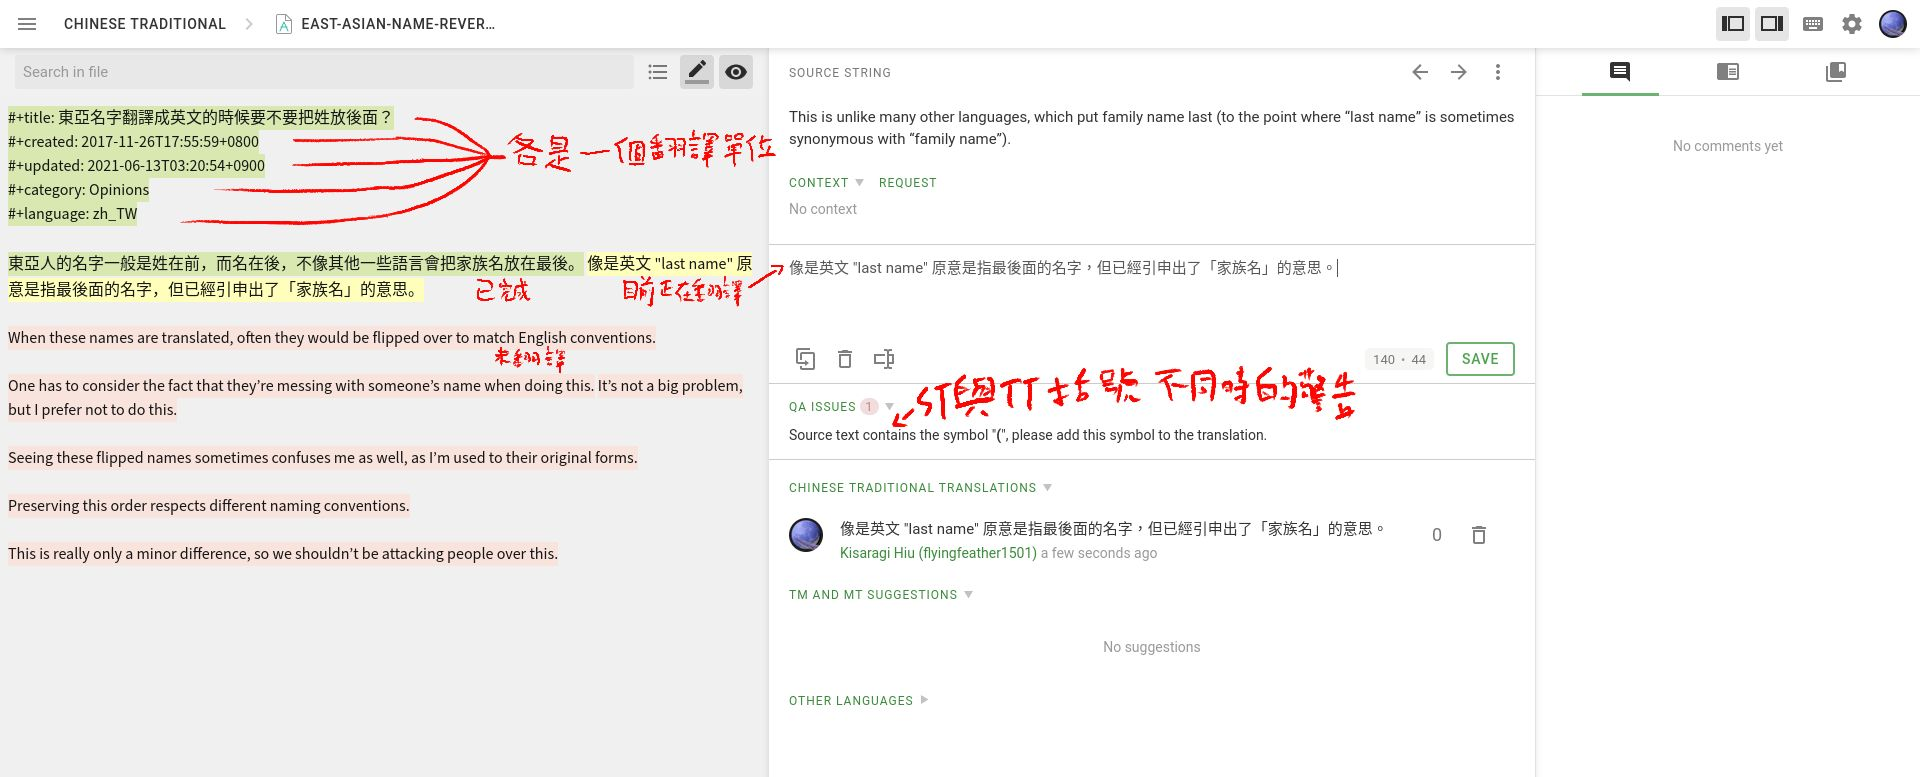 https://d33wubrfki0l68.cloudfront.net/6b3387c7eff23112a9674d042ae759387bfa81fa/45d63/crowdin/crowdin-translate-in-progress.jpg